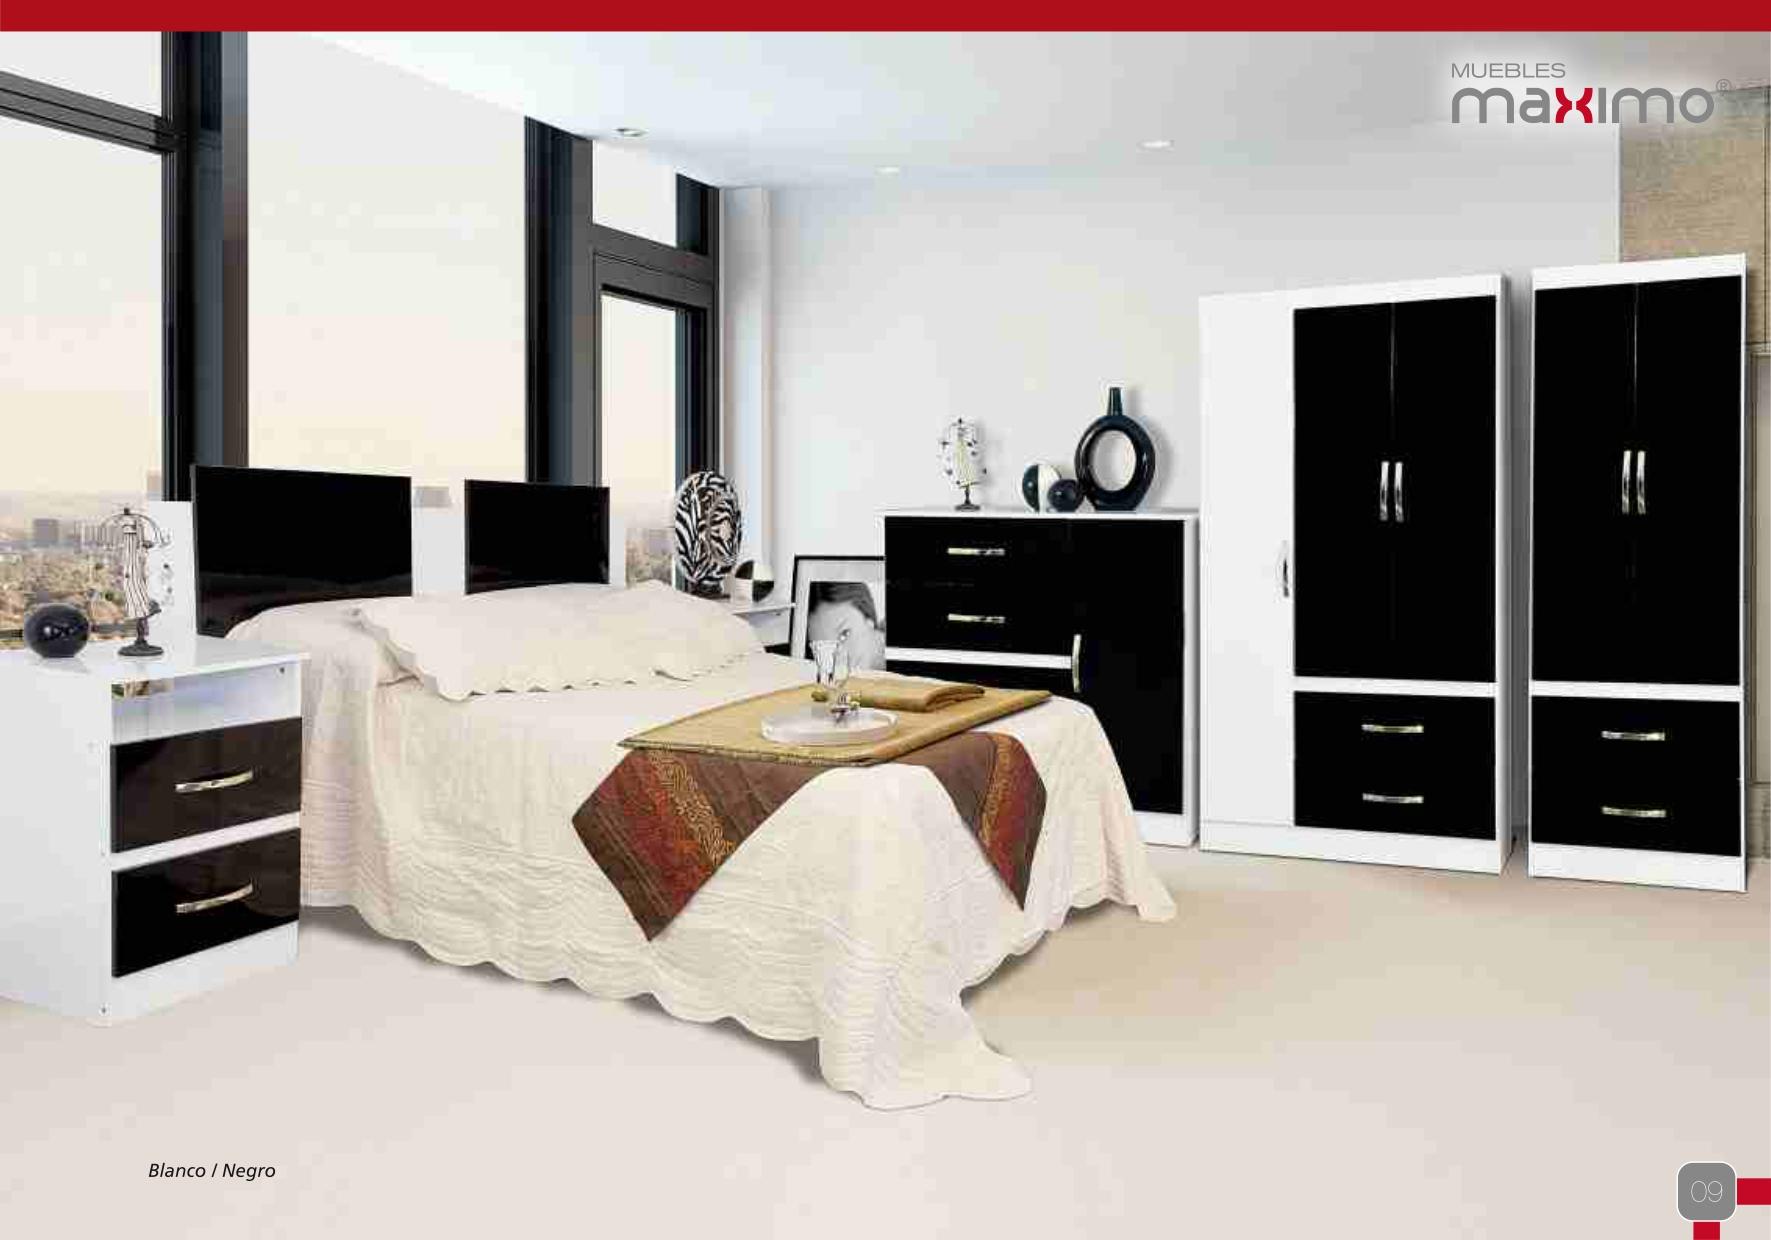 Muebles Maximo Salta - Catalogo 2016 Hacemos Hogares Confortables[mjhdah]http://www.mueblesmaximo.com.ar/imagenes_misaplicaciones/WG4_33619___5.jpg